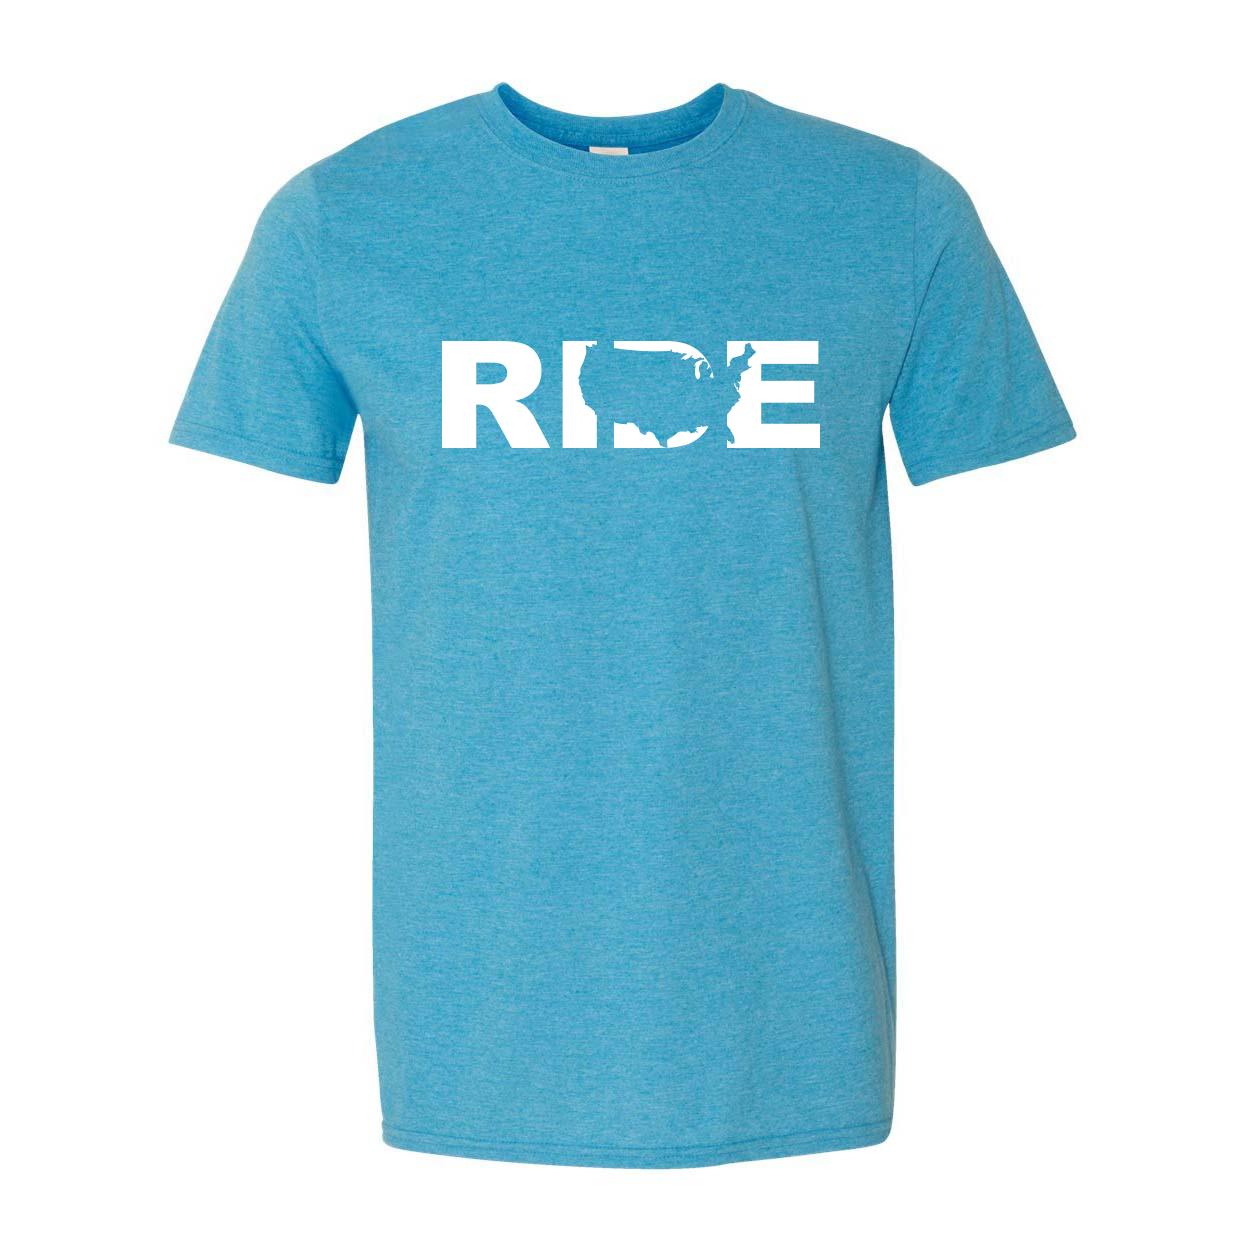 Ride United States Classic T-Shirt Heather Sapphire Blue (White Logo)